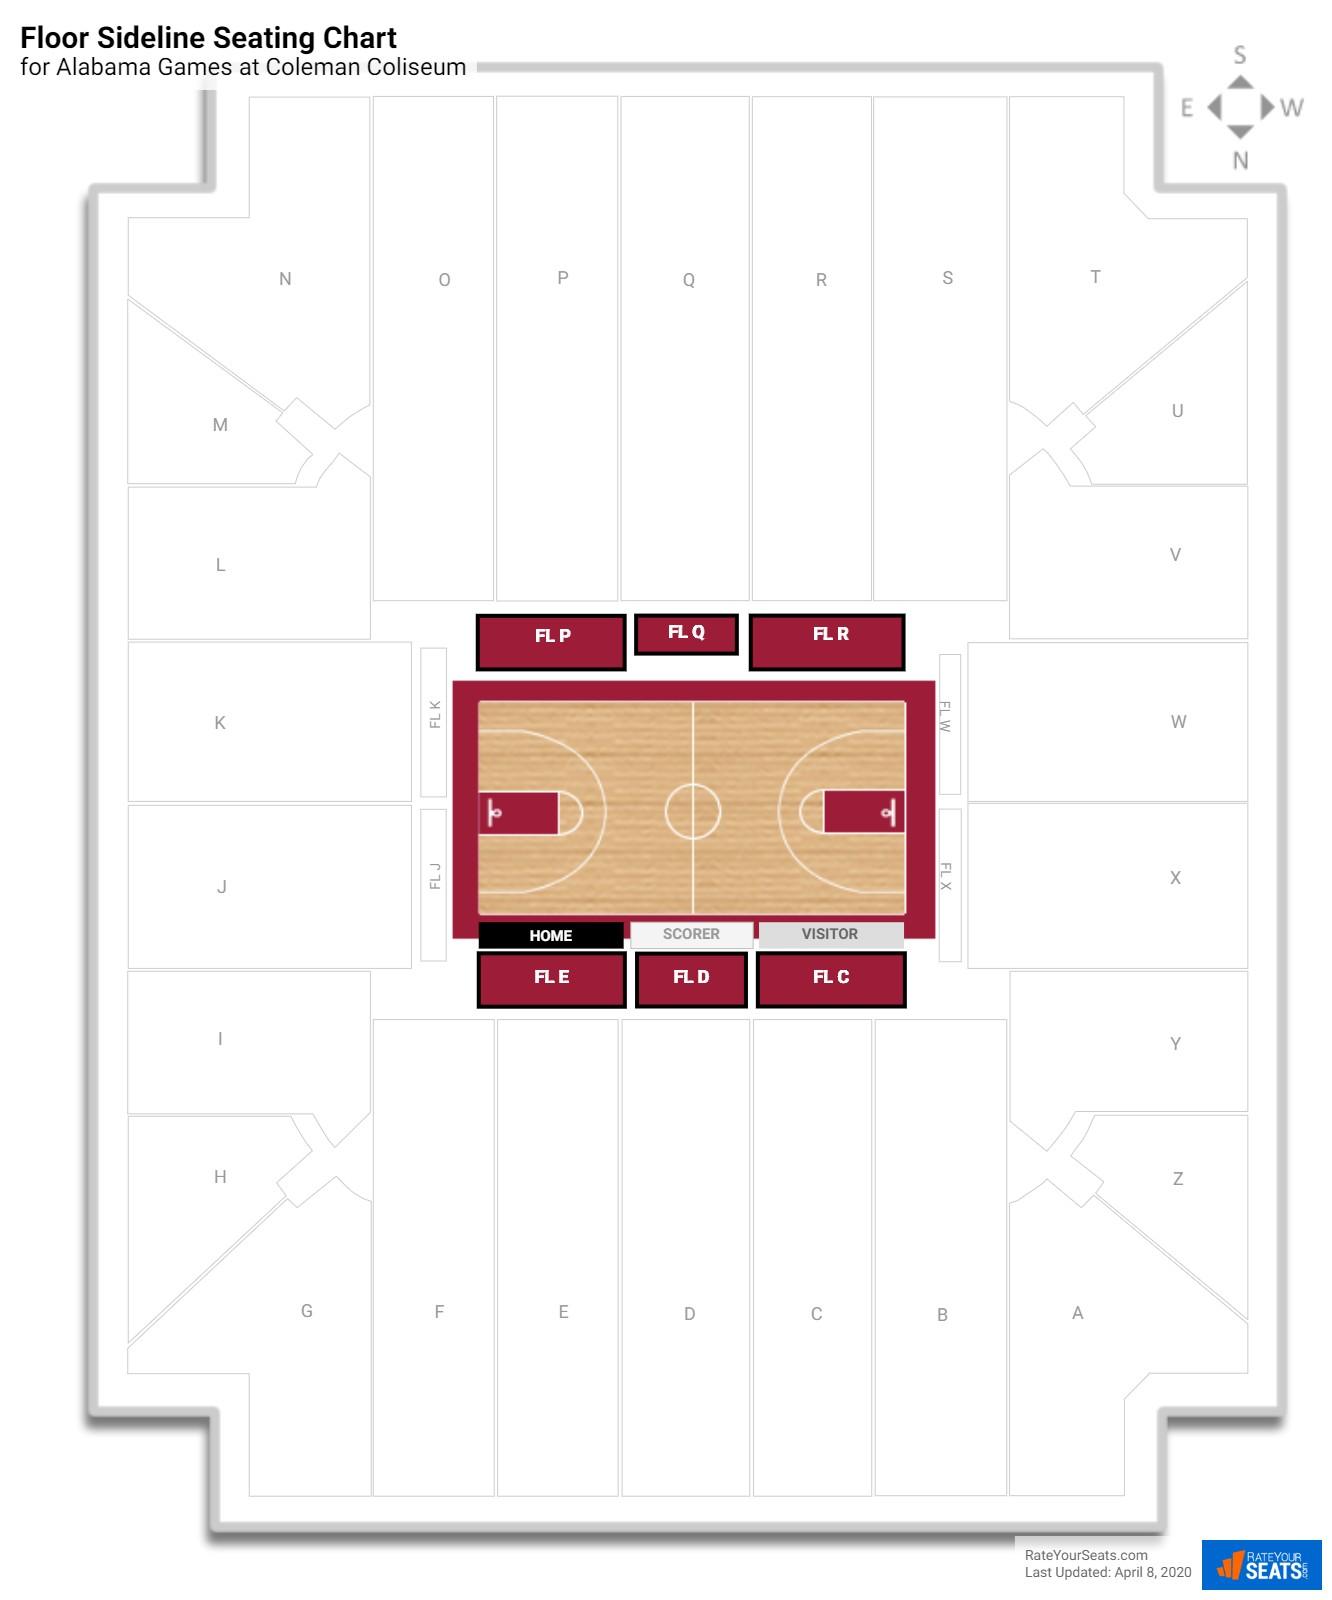 Coleman coliseum alabama seating guide rateyourseats com